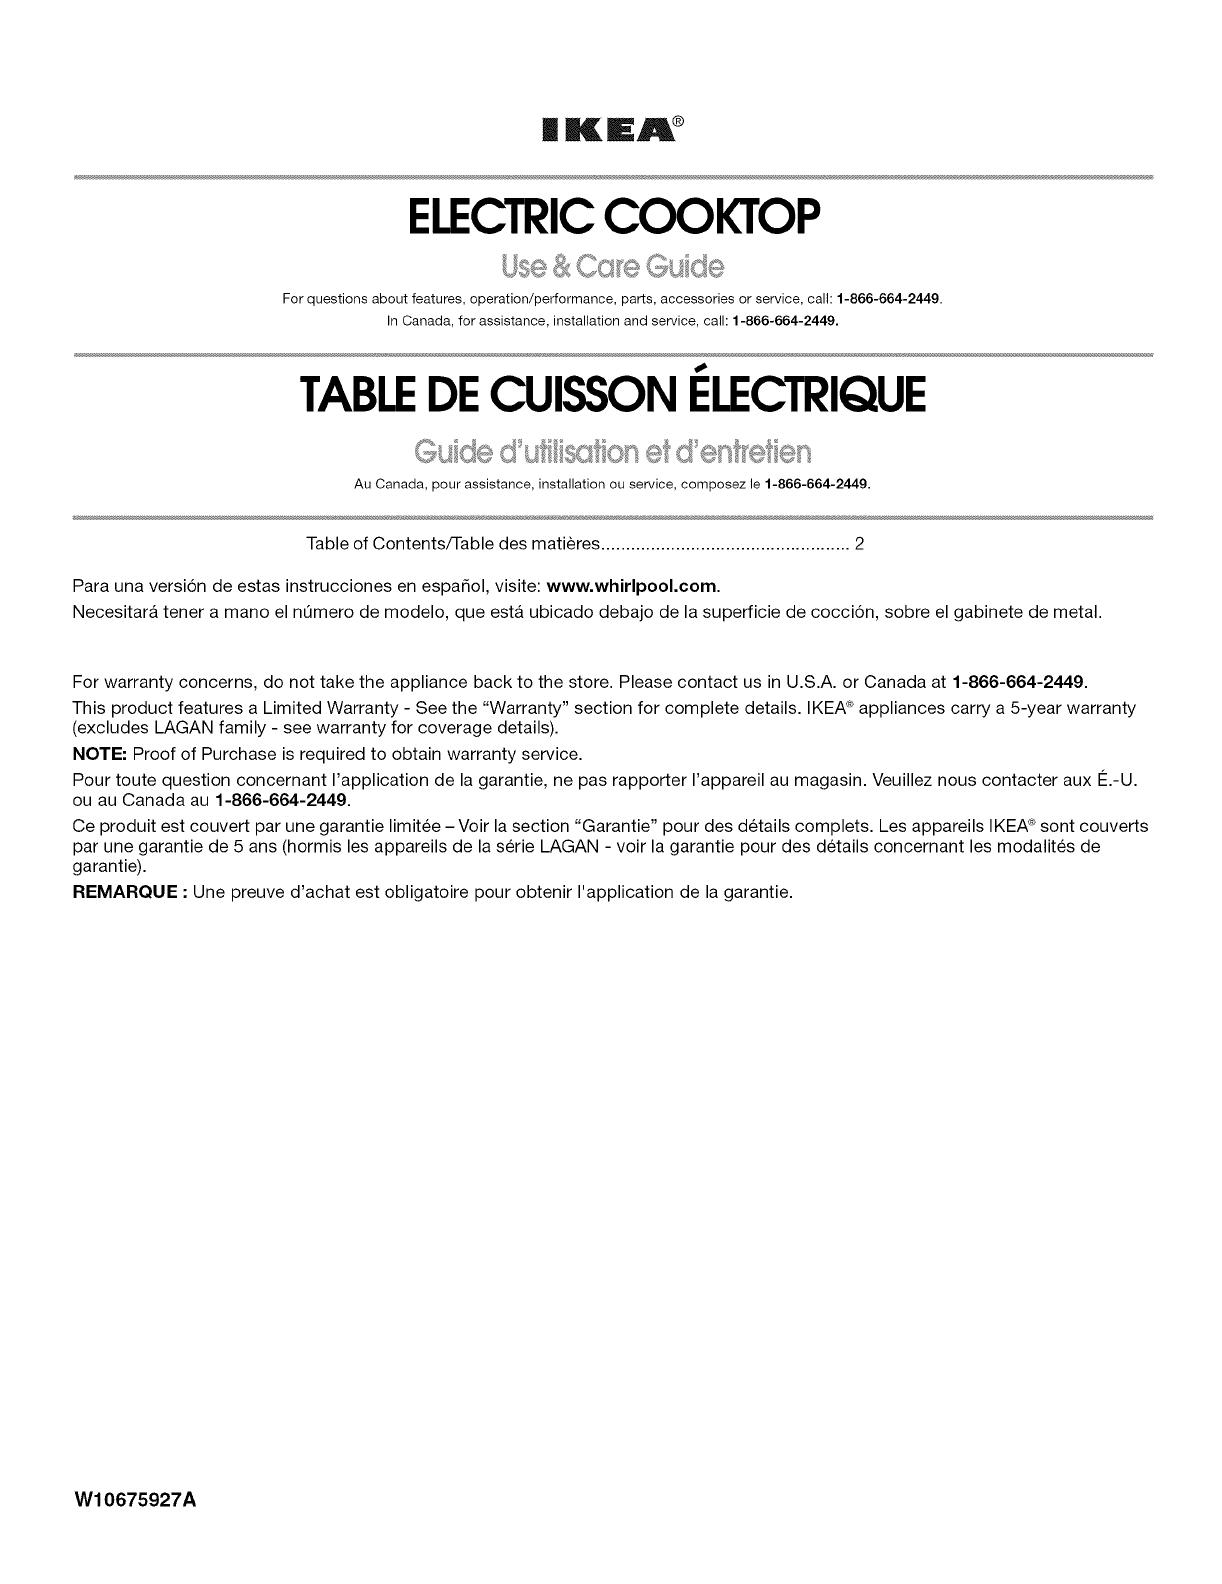 Fond De Hotte Verre Ikea ikea icr444db00 user manual electric cooktop manuals and